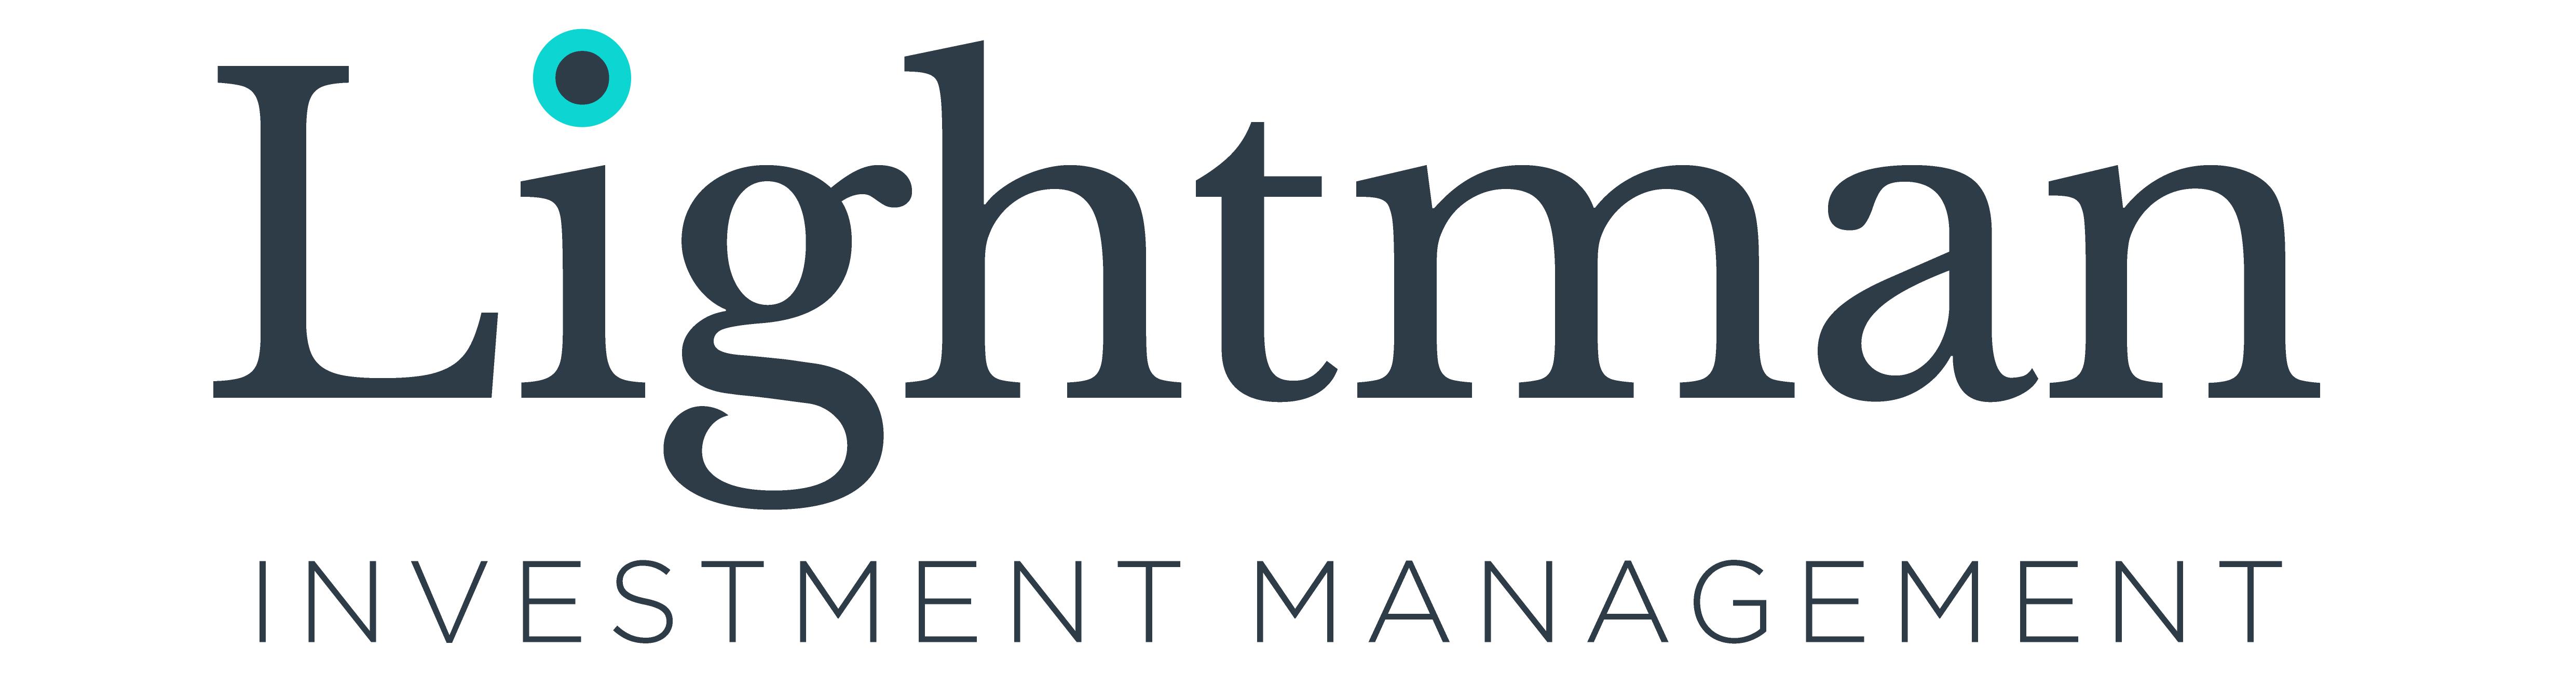 Lightman Investment Management